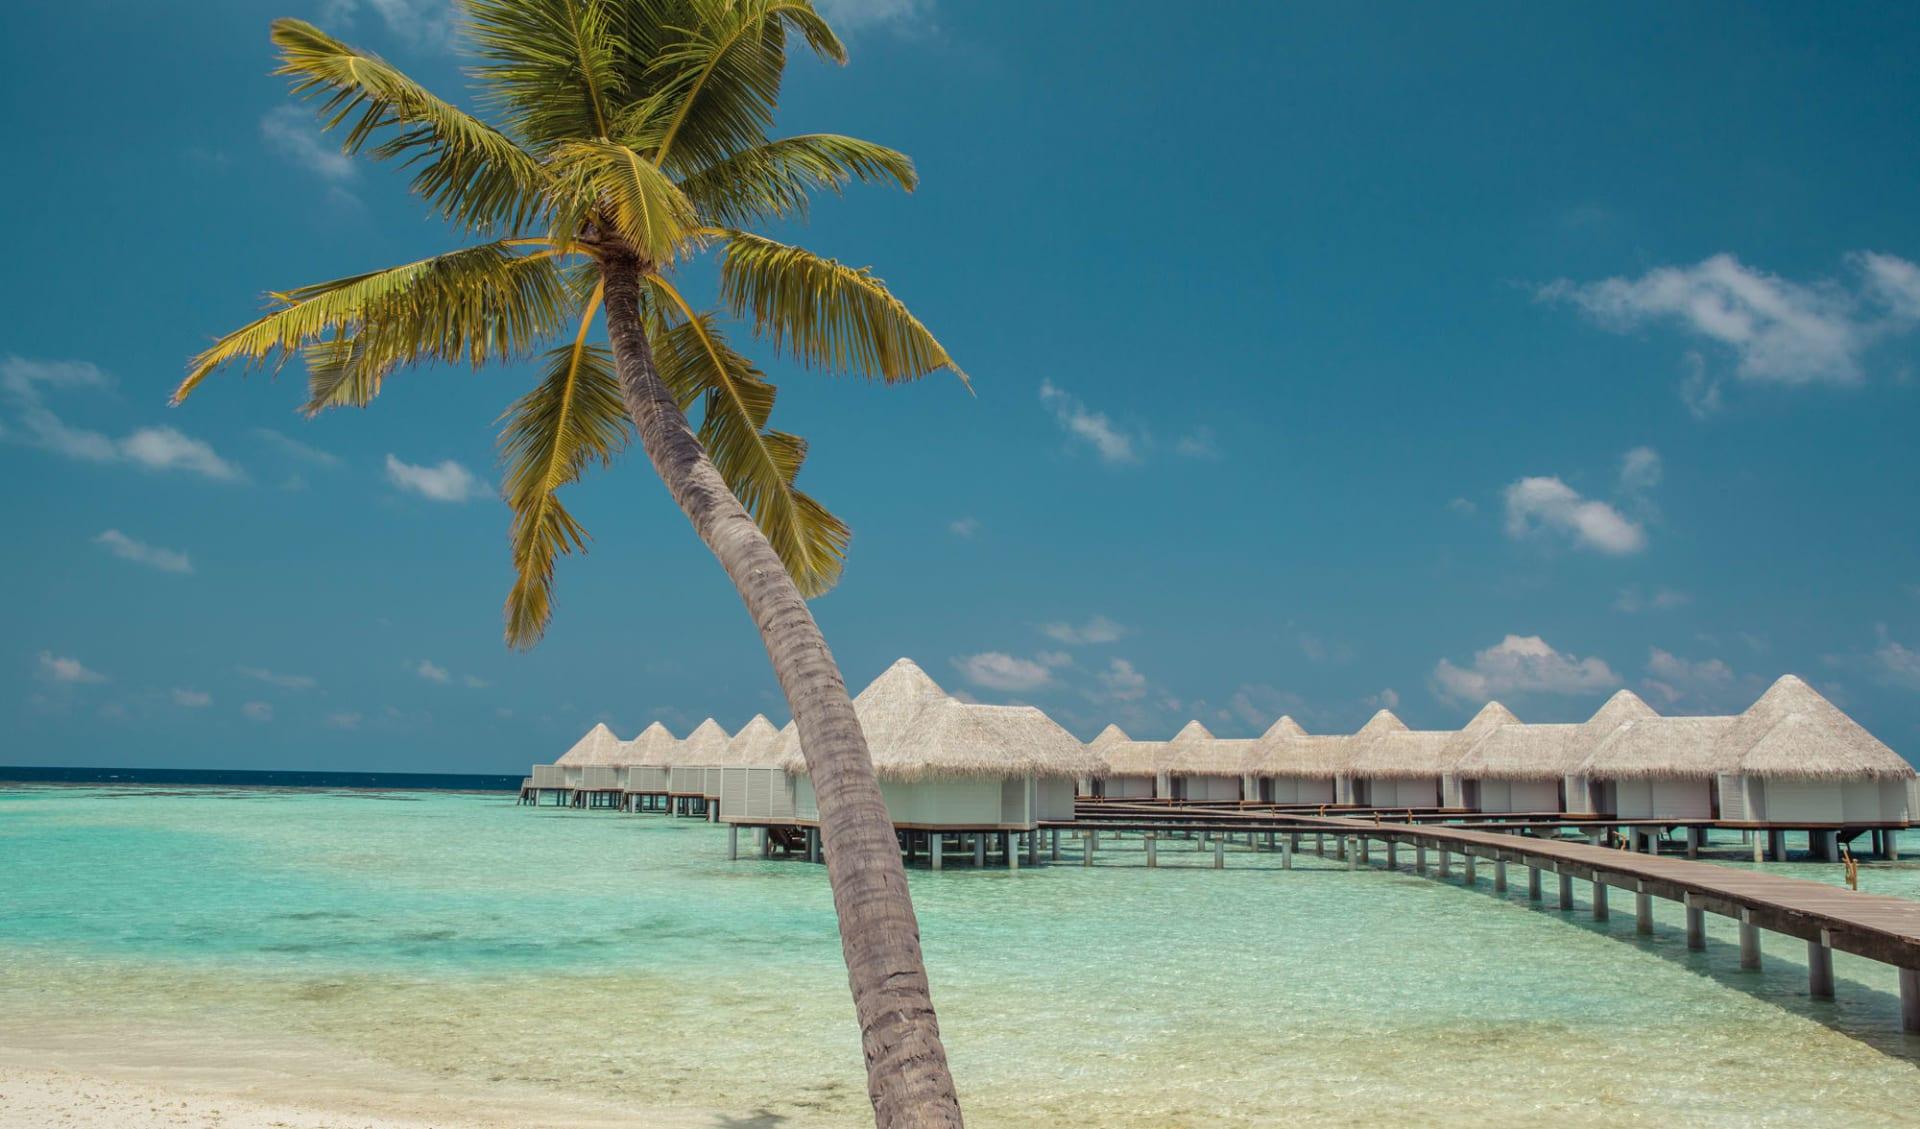 Drift Thelu Veliga Retreat in Ari-Atoll:  Water Villas